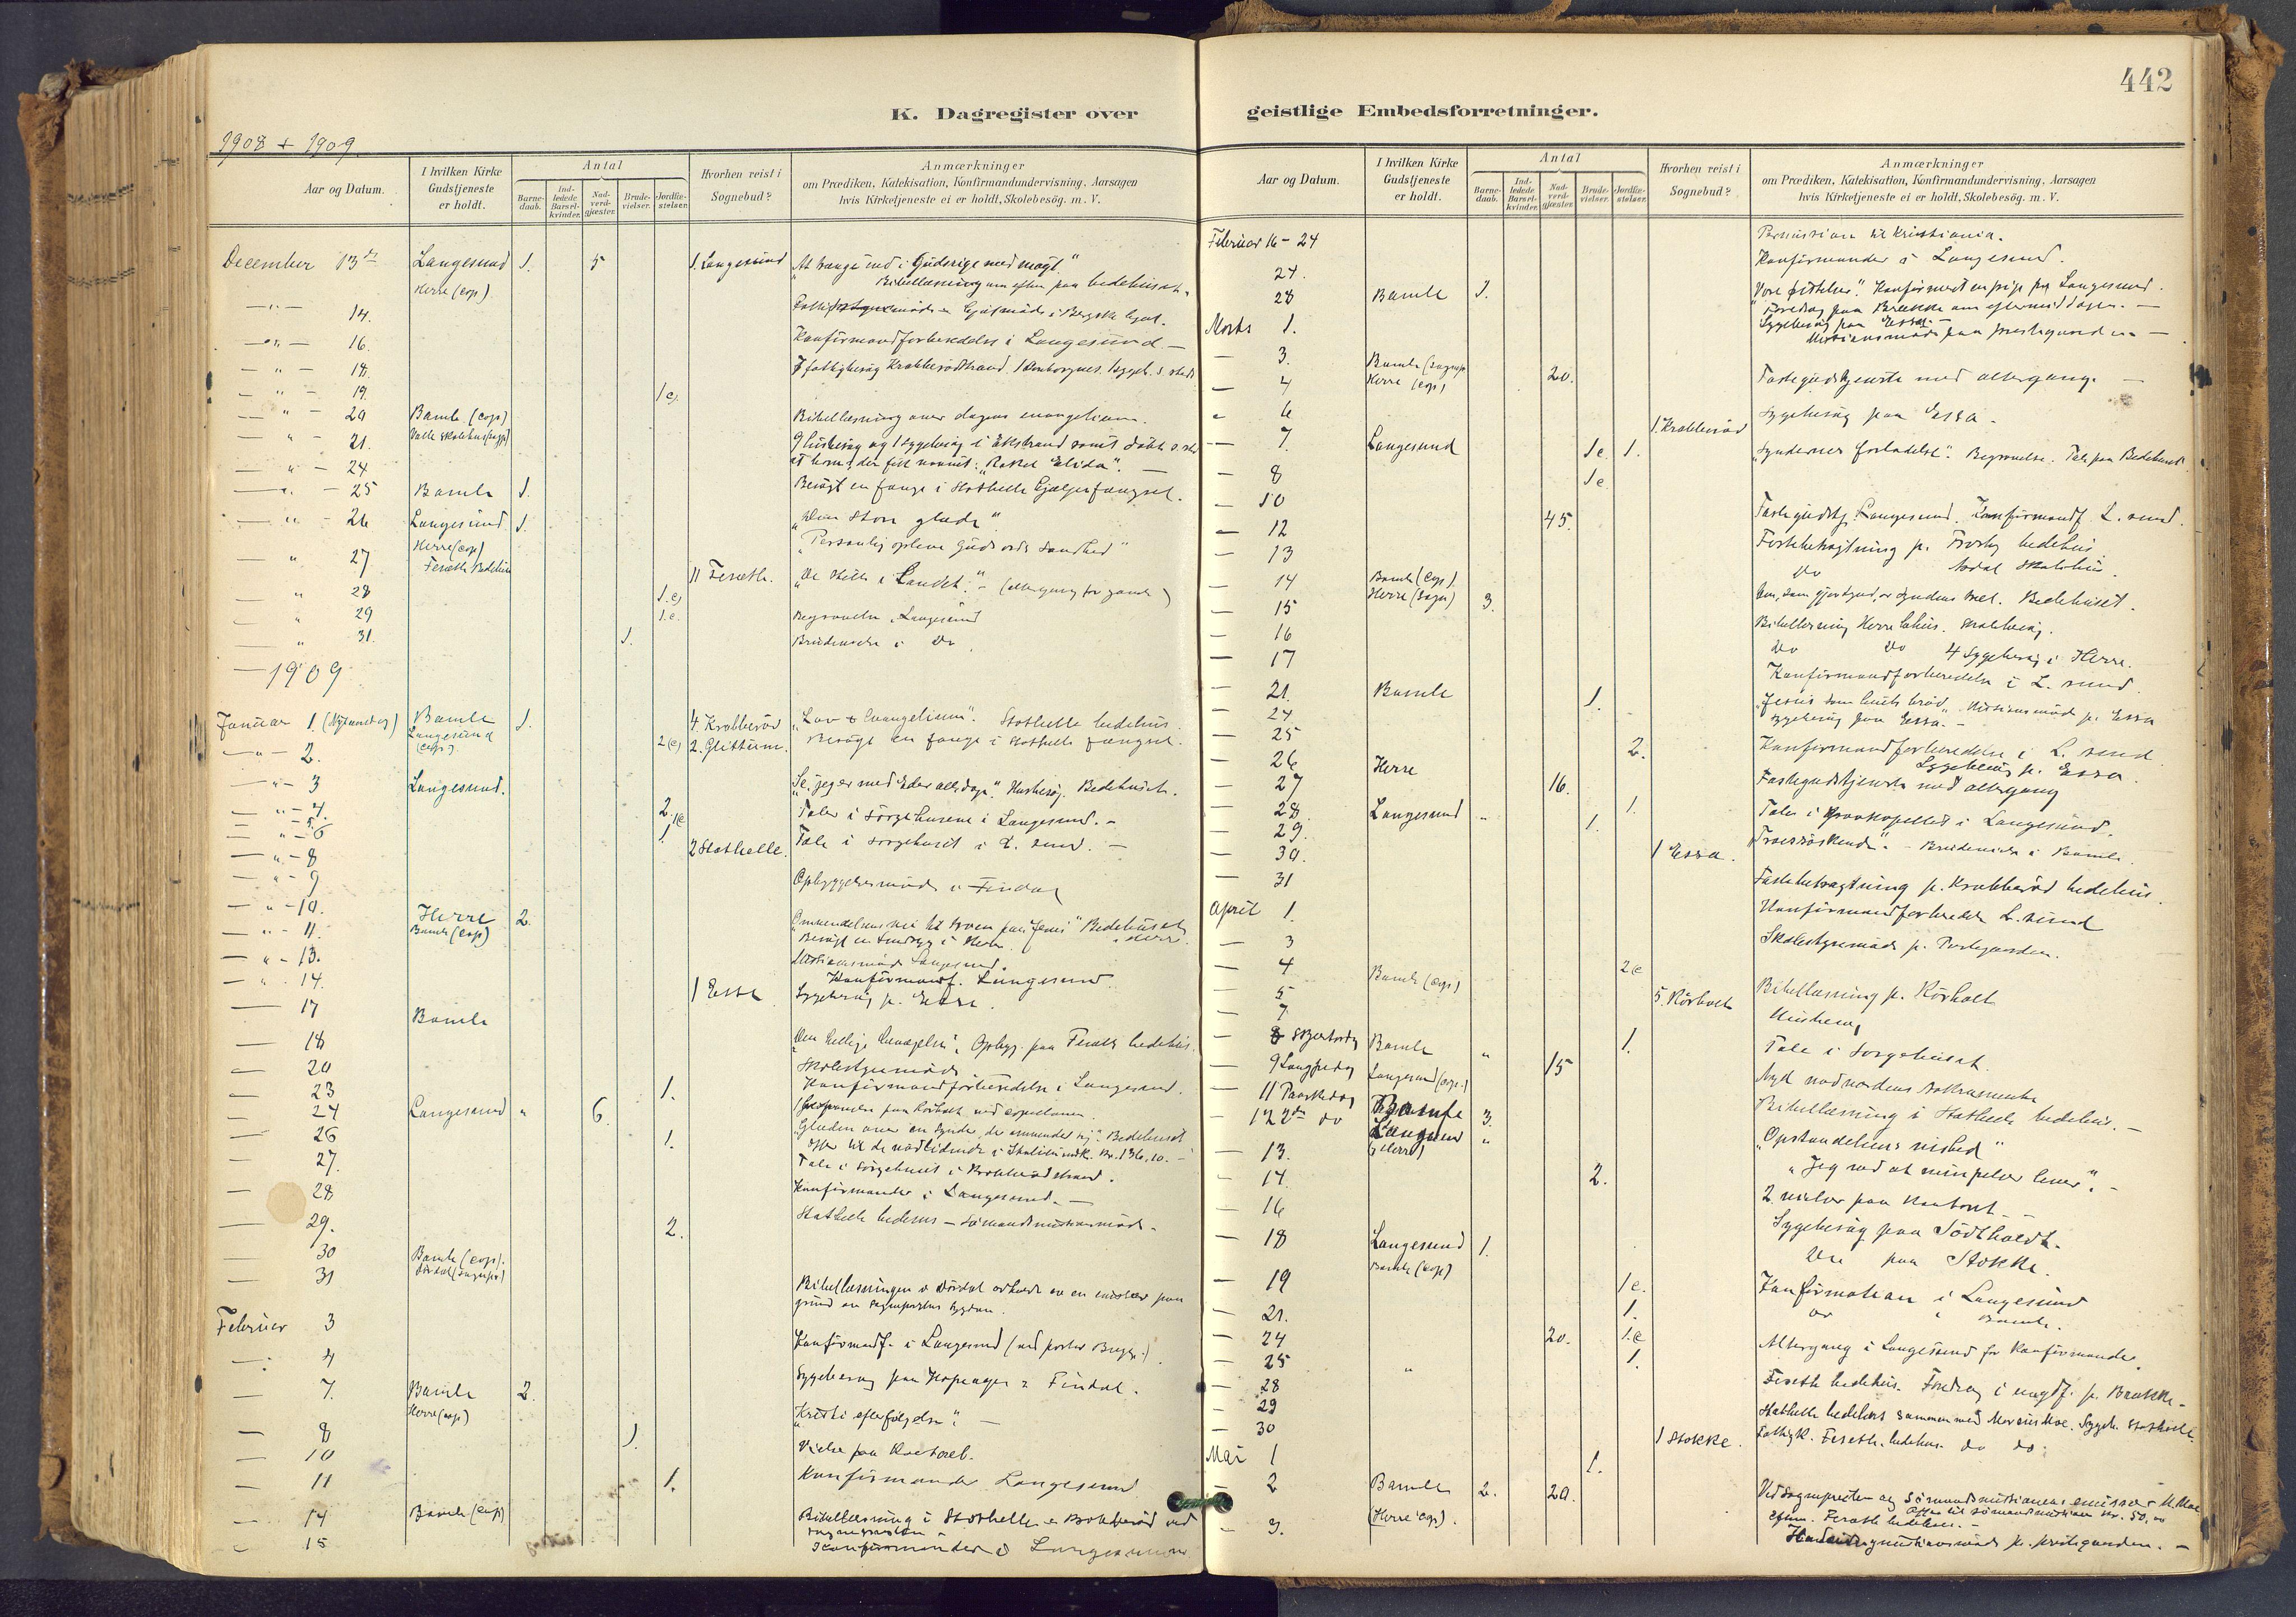 SAKO, Bamble kirkebøker, F/Fa/L0009: Ministerialbok nr. I 9, 1901-1917, s. 442